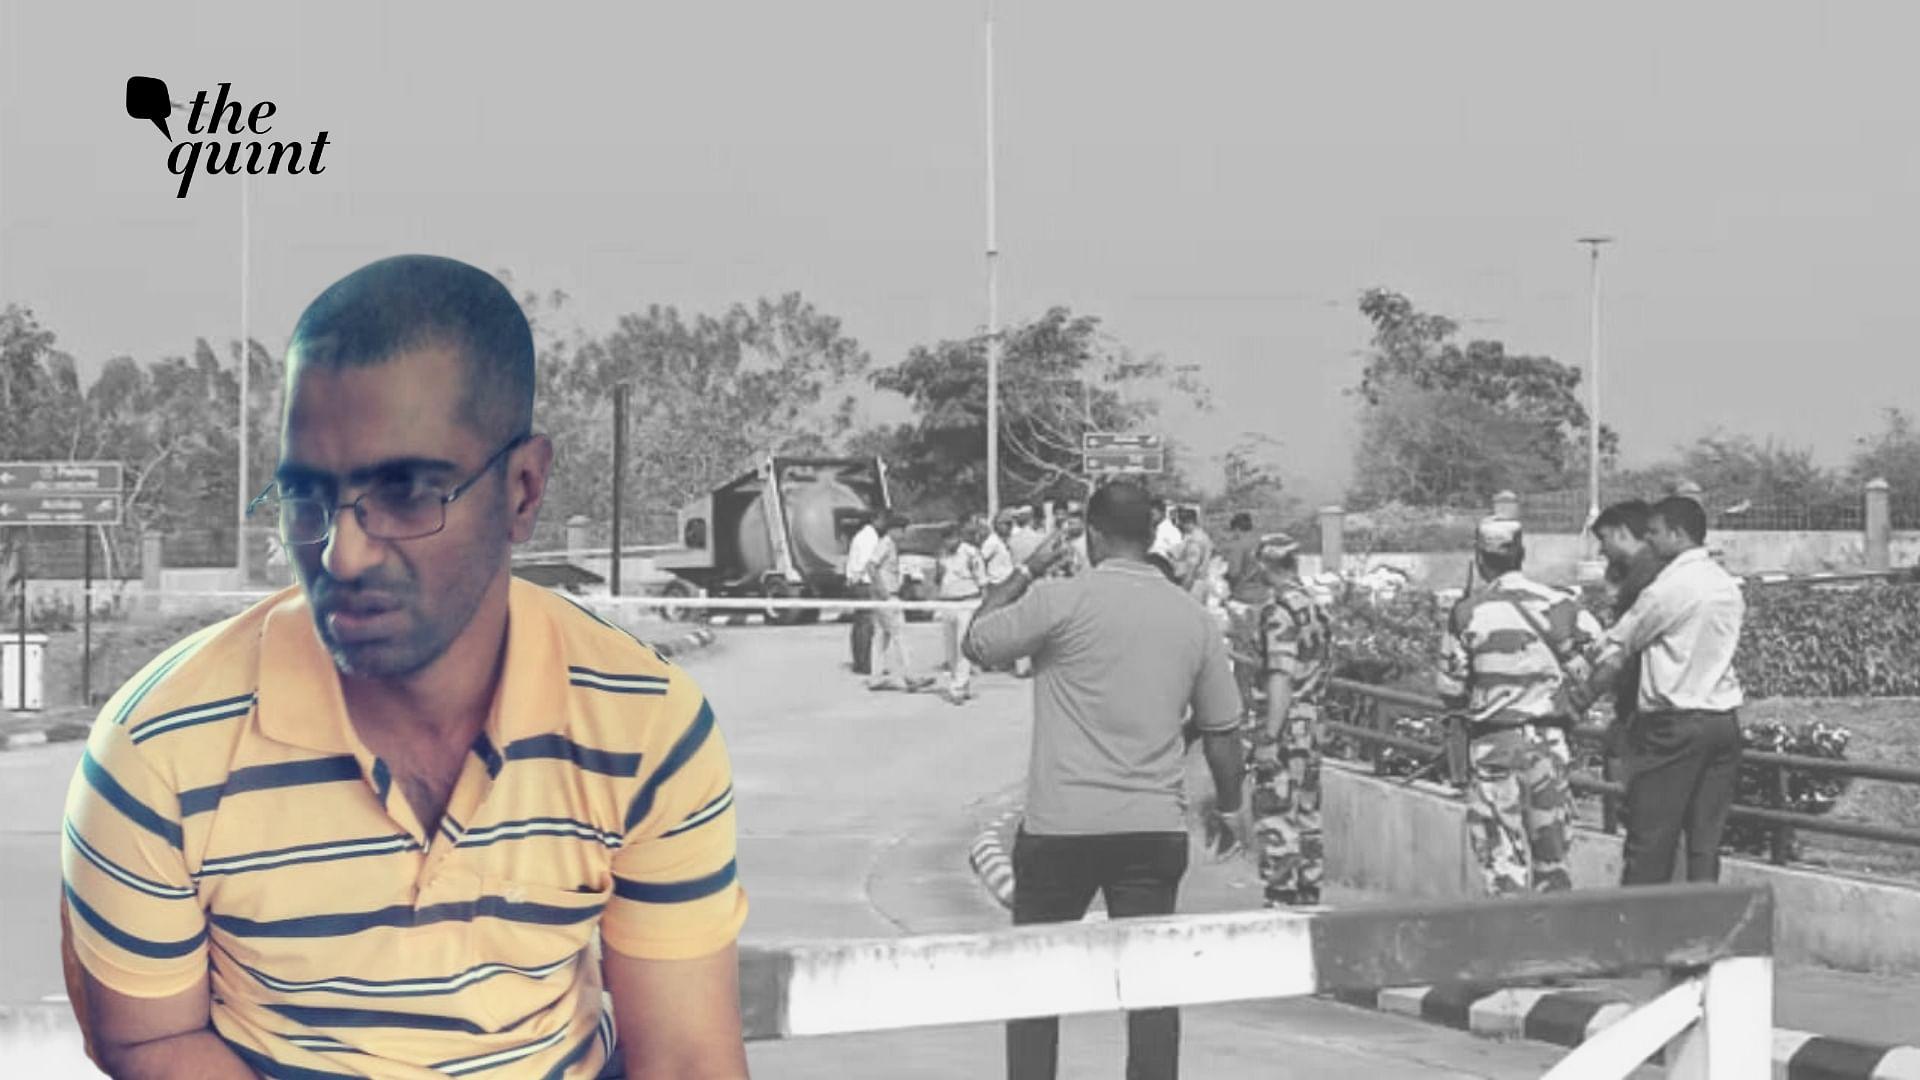 M'luru Airport Bomb: Police Recovers Suspicious Box From Suspect